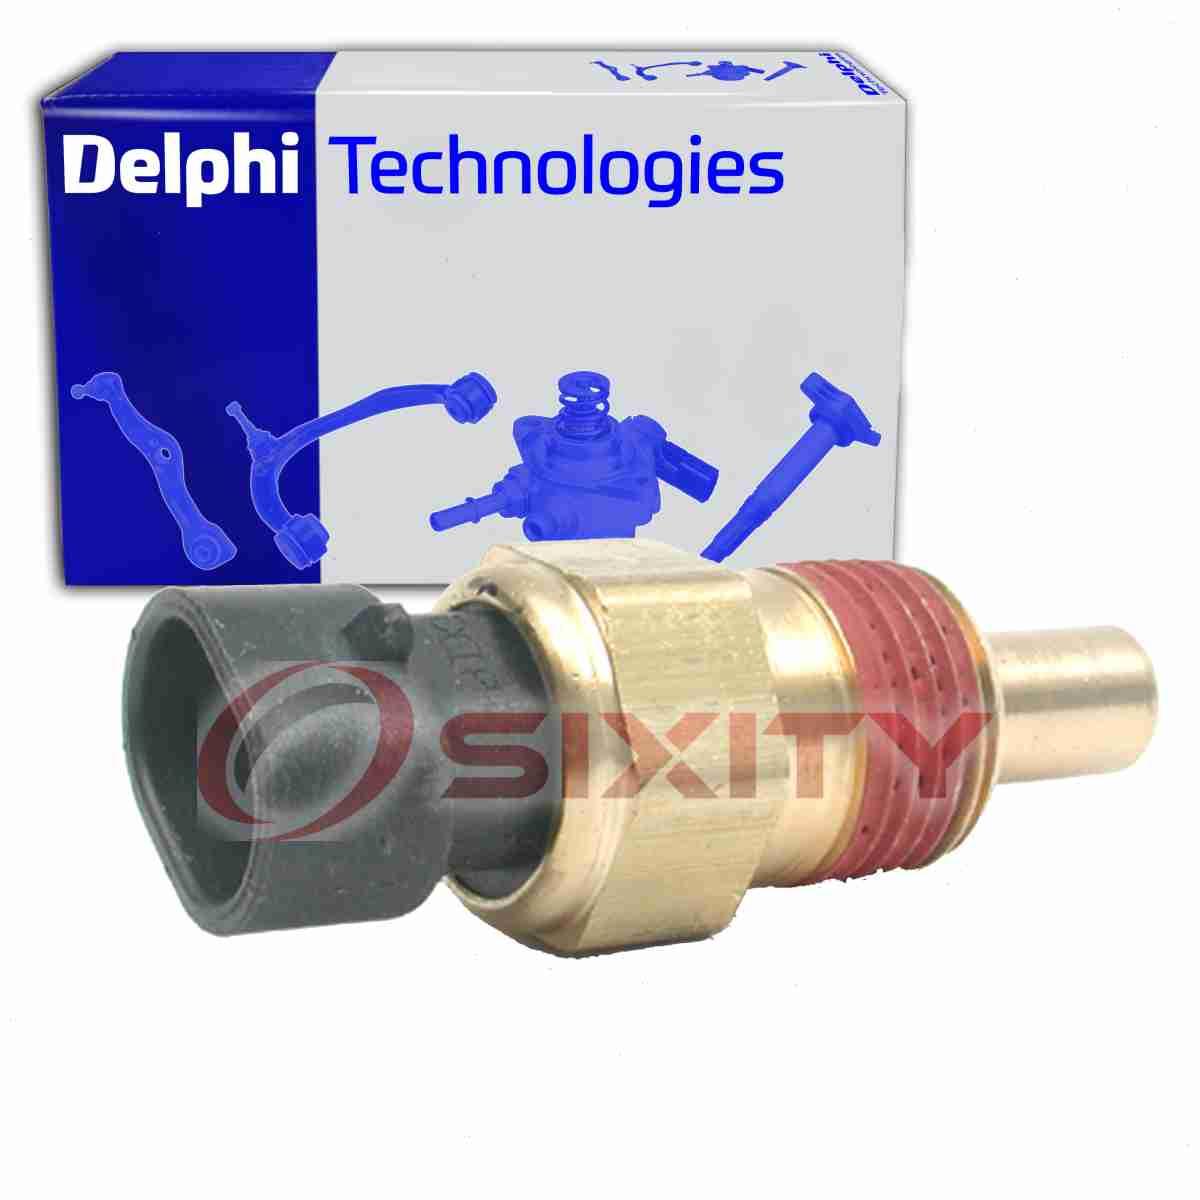 Delphi Coolant Temperature Sensor for 1985-1999 GMC K1500 5.7L V8 Engine xp